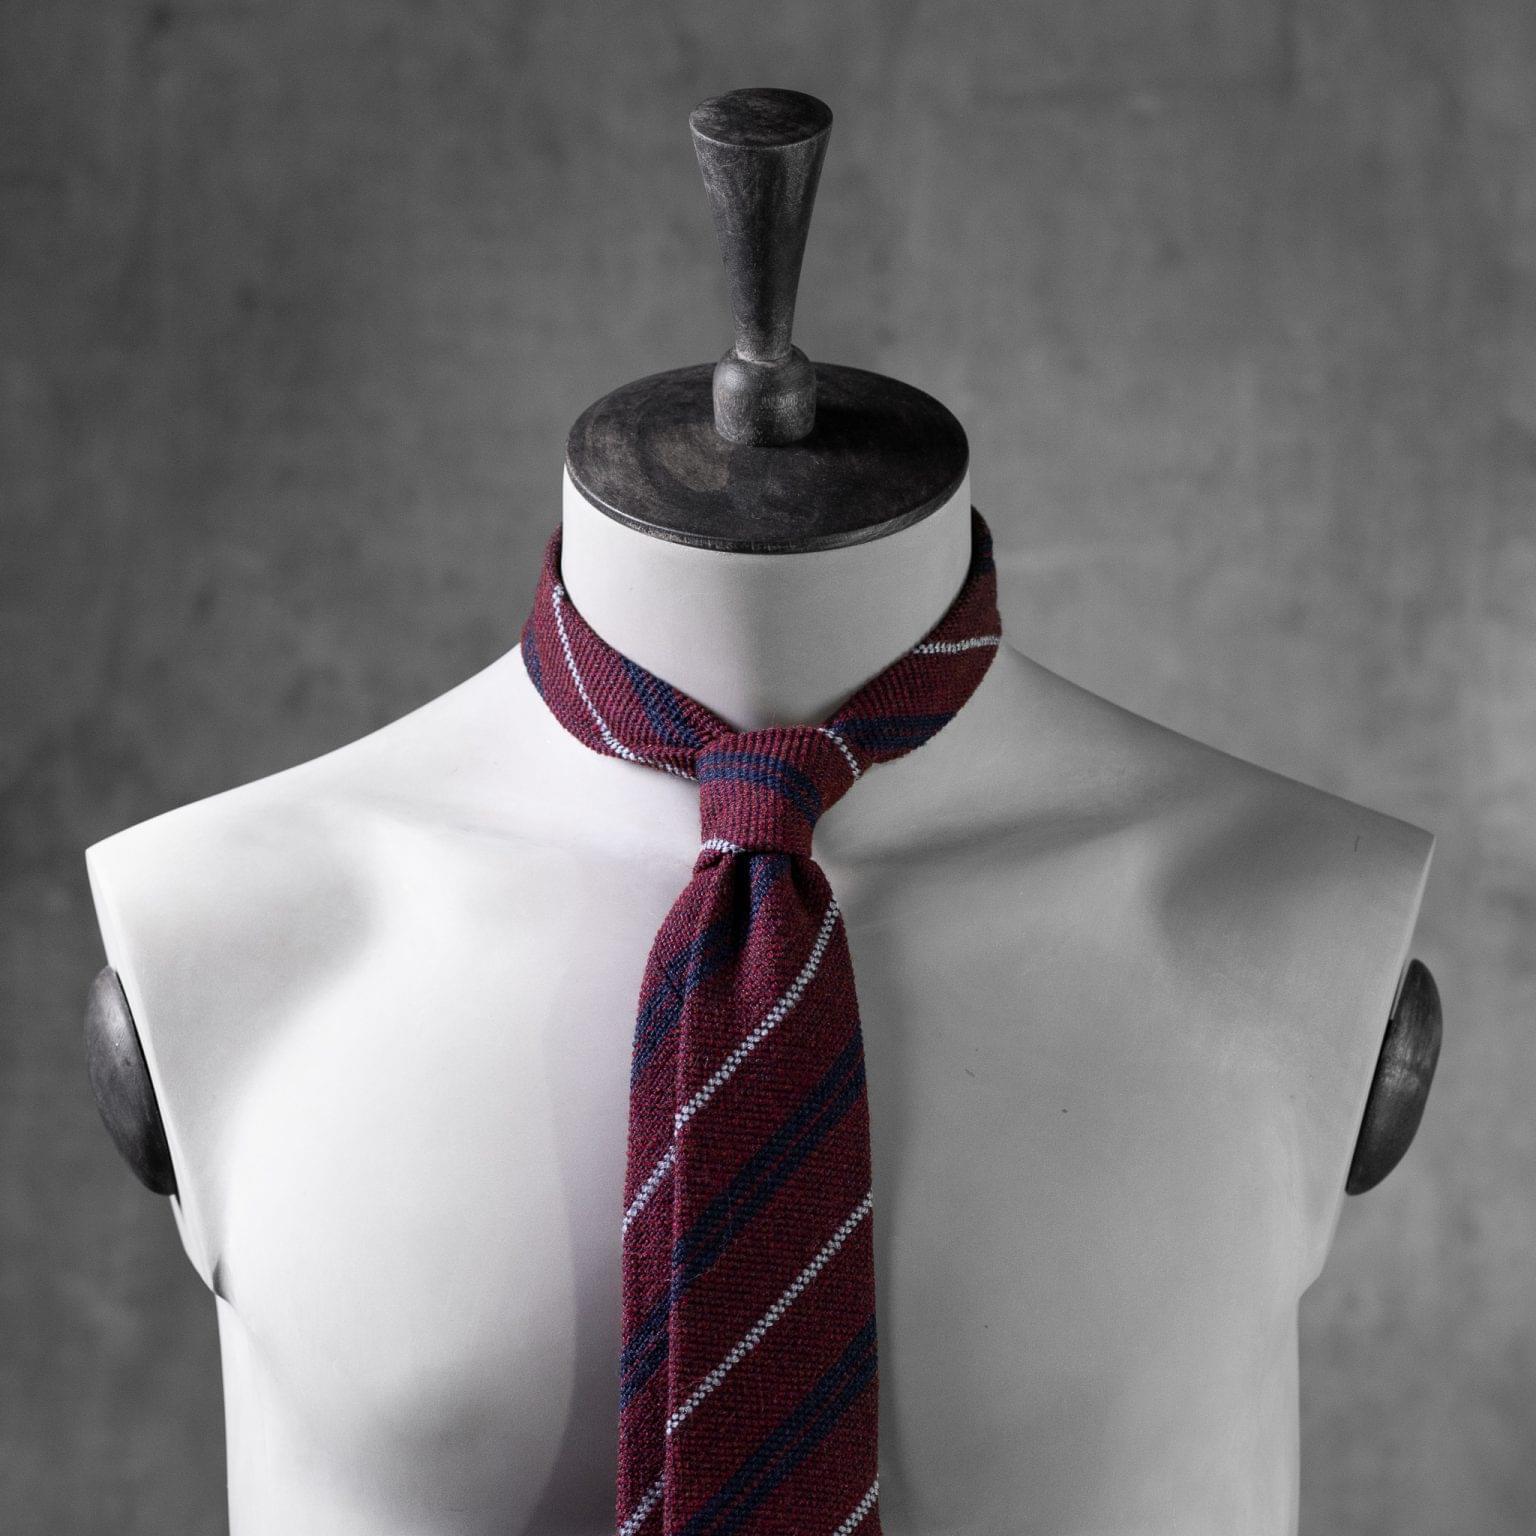 WOOL-LANA-0482-Tie-Initials-Corbata-Iniciales-The-Seelk-3